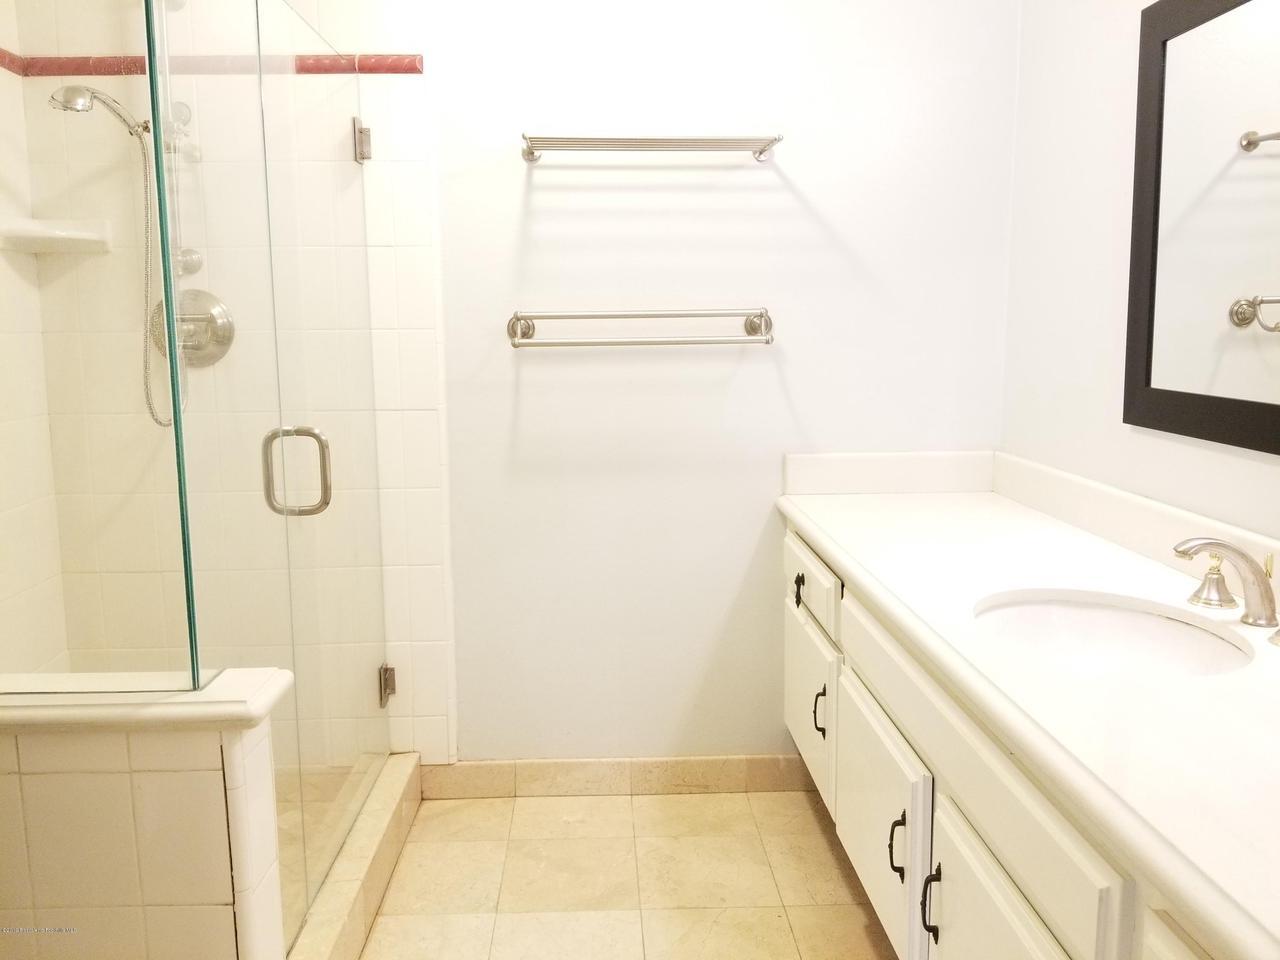 124 MONTEREY, South Pasadena, CA 91030 - Bath